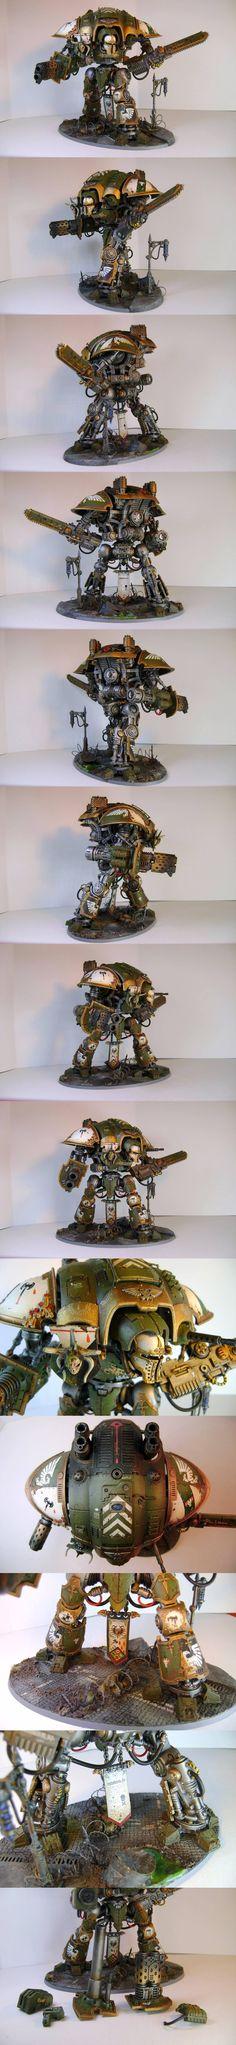 Imperial Knight - Cadmus